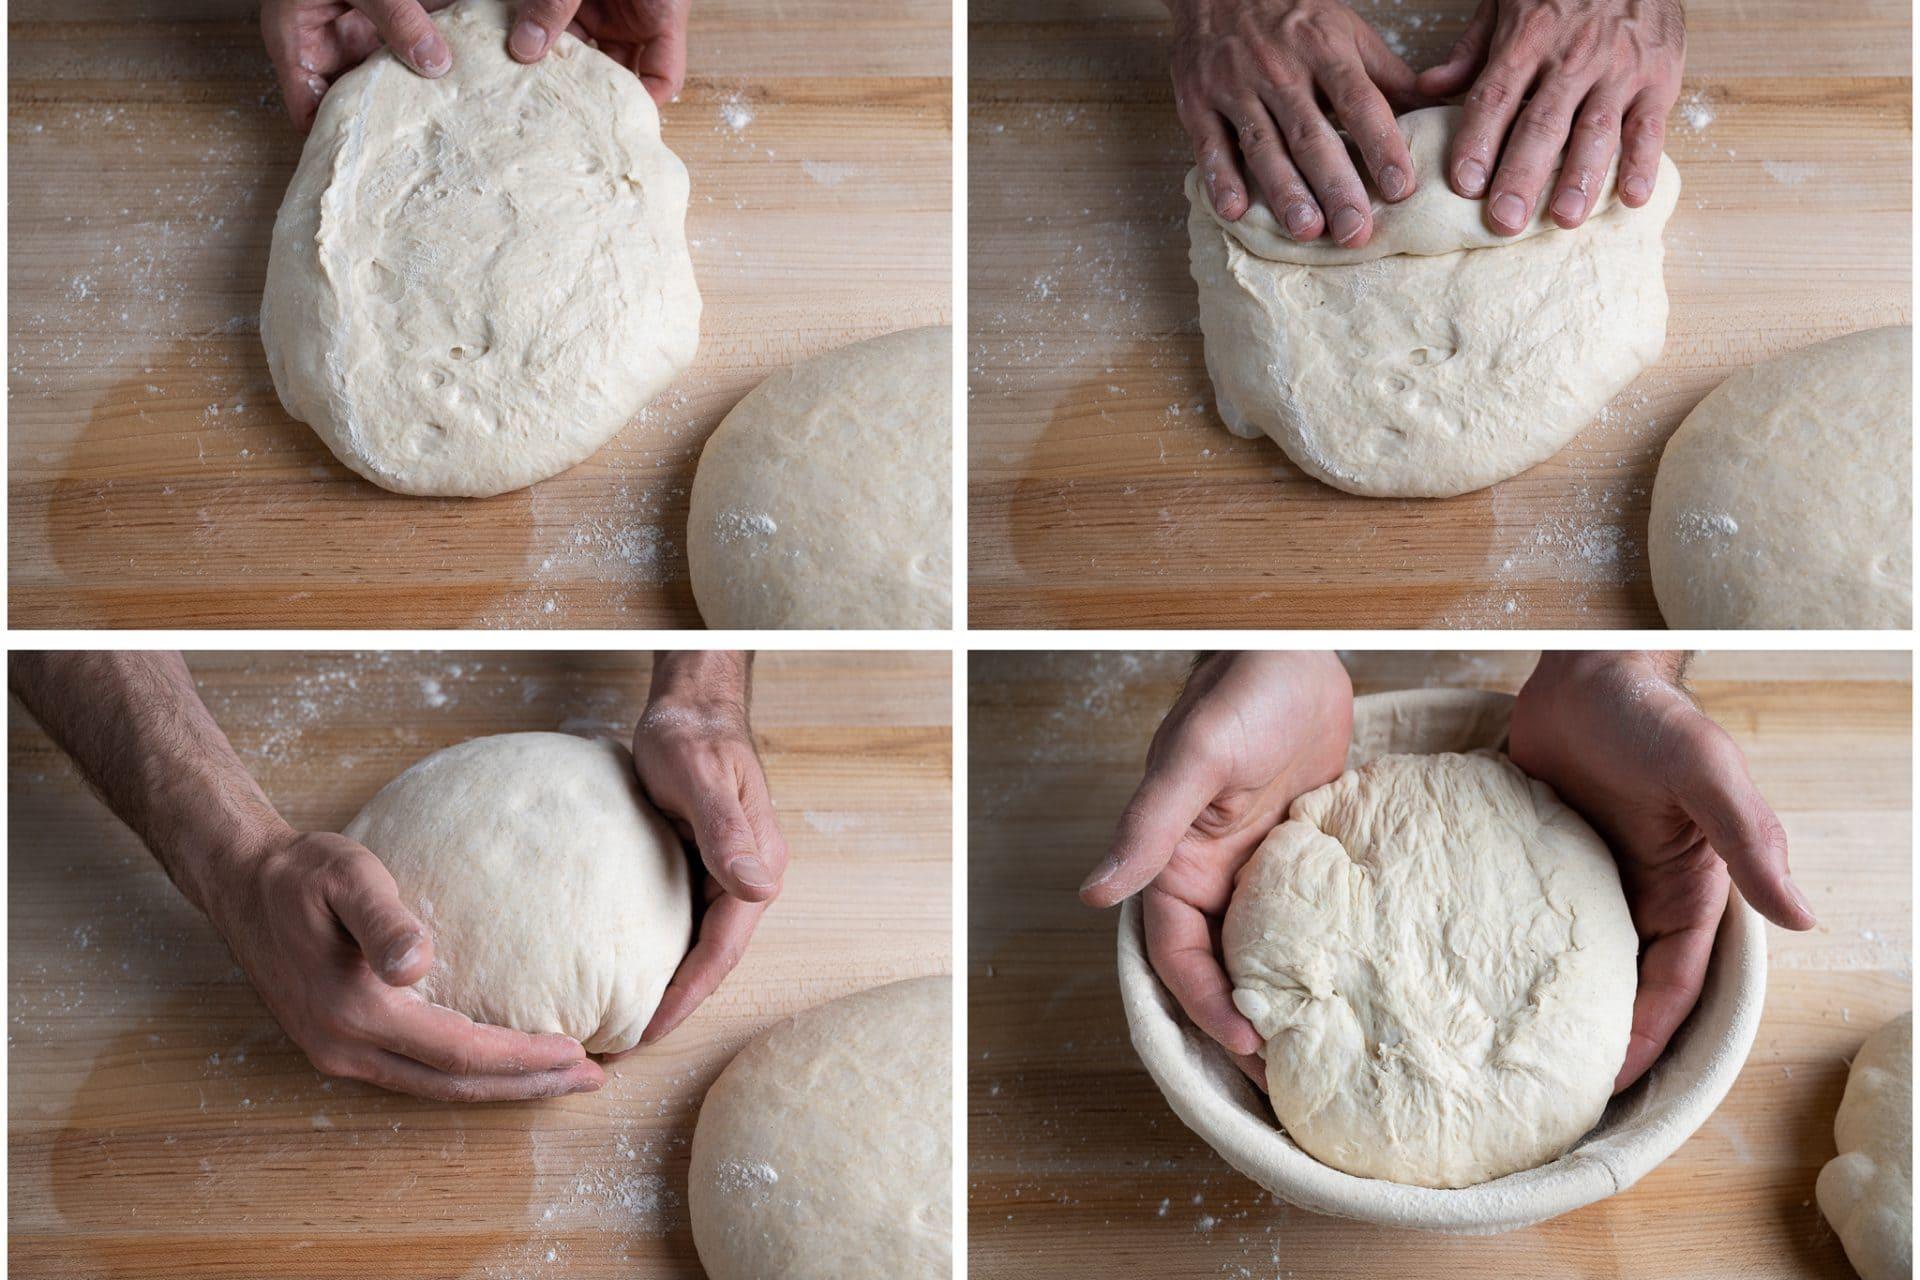 Shaping no-knead sourdough bread